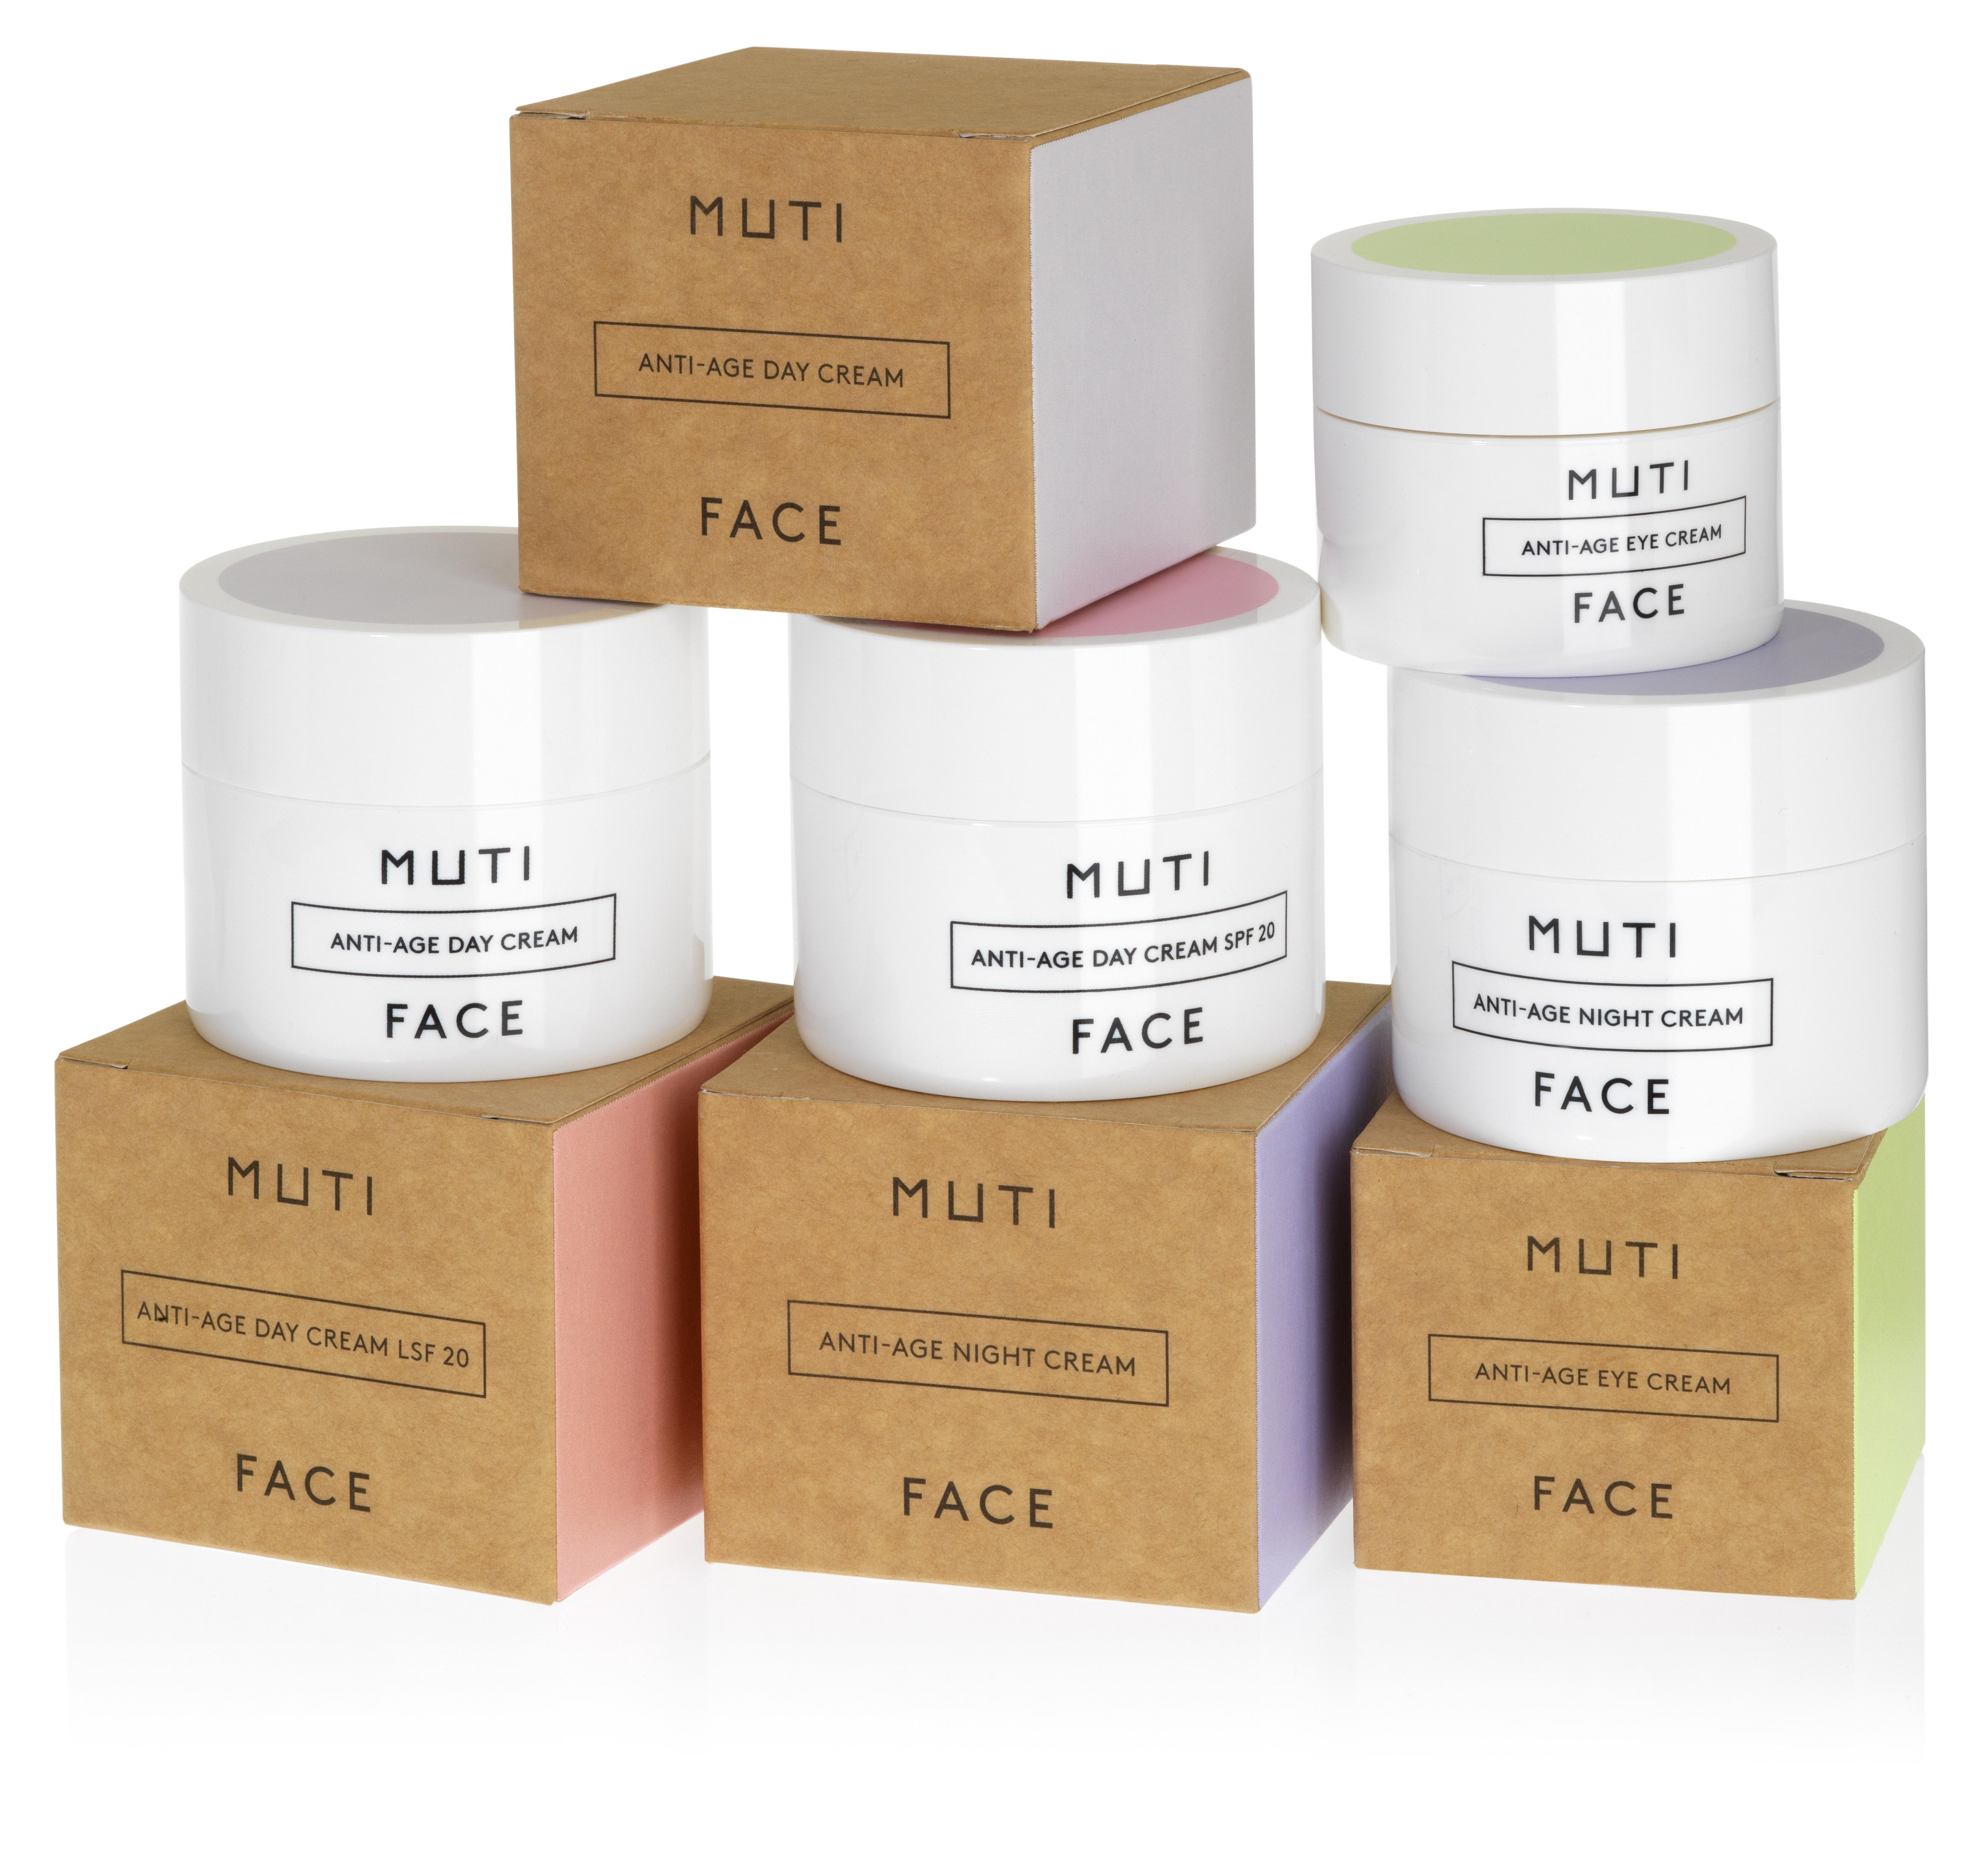 Muti Face_group 3